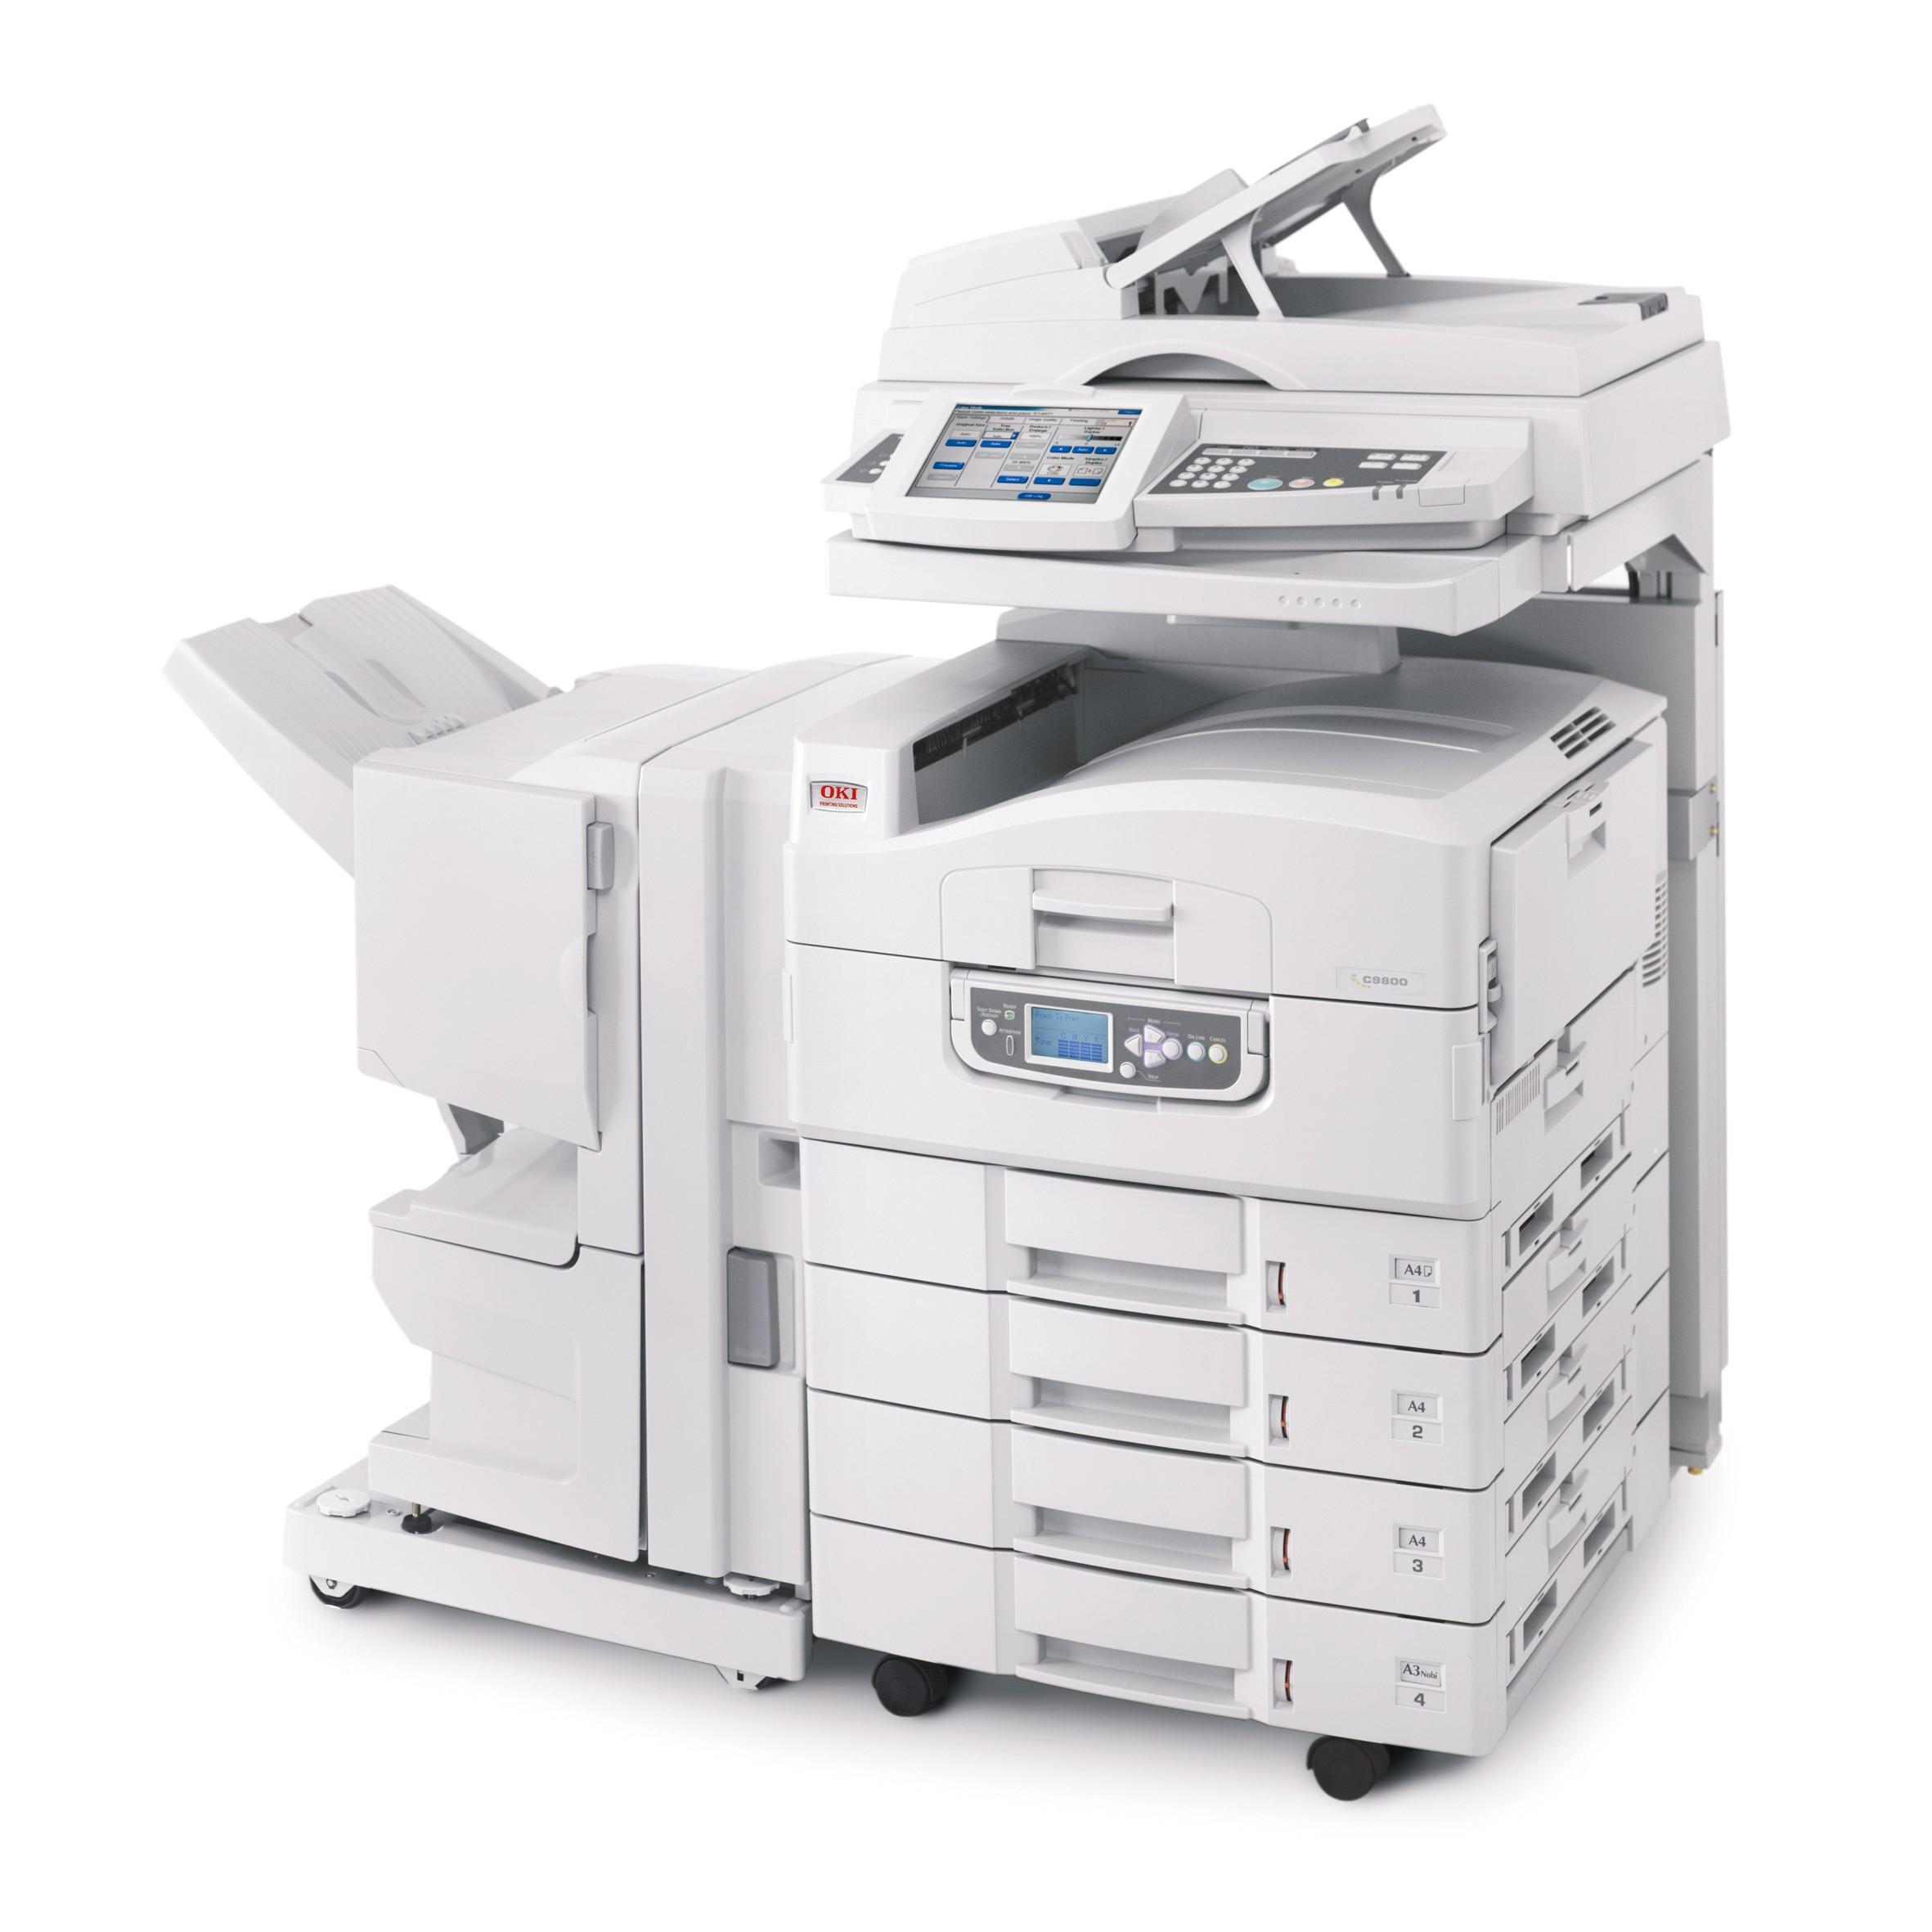 C9800 MFP